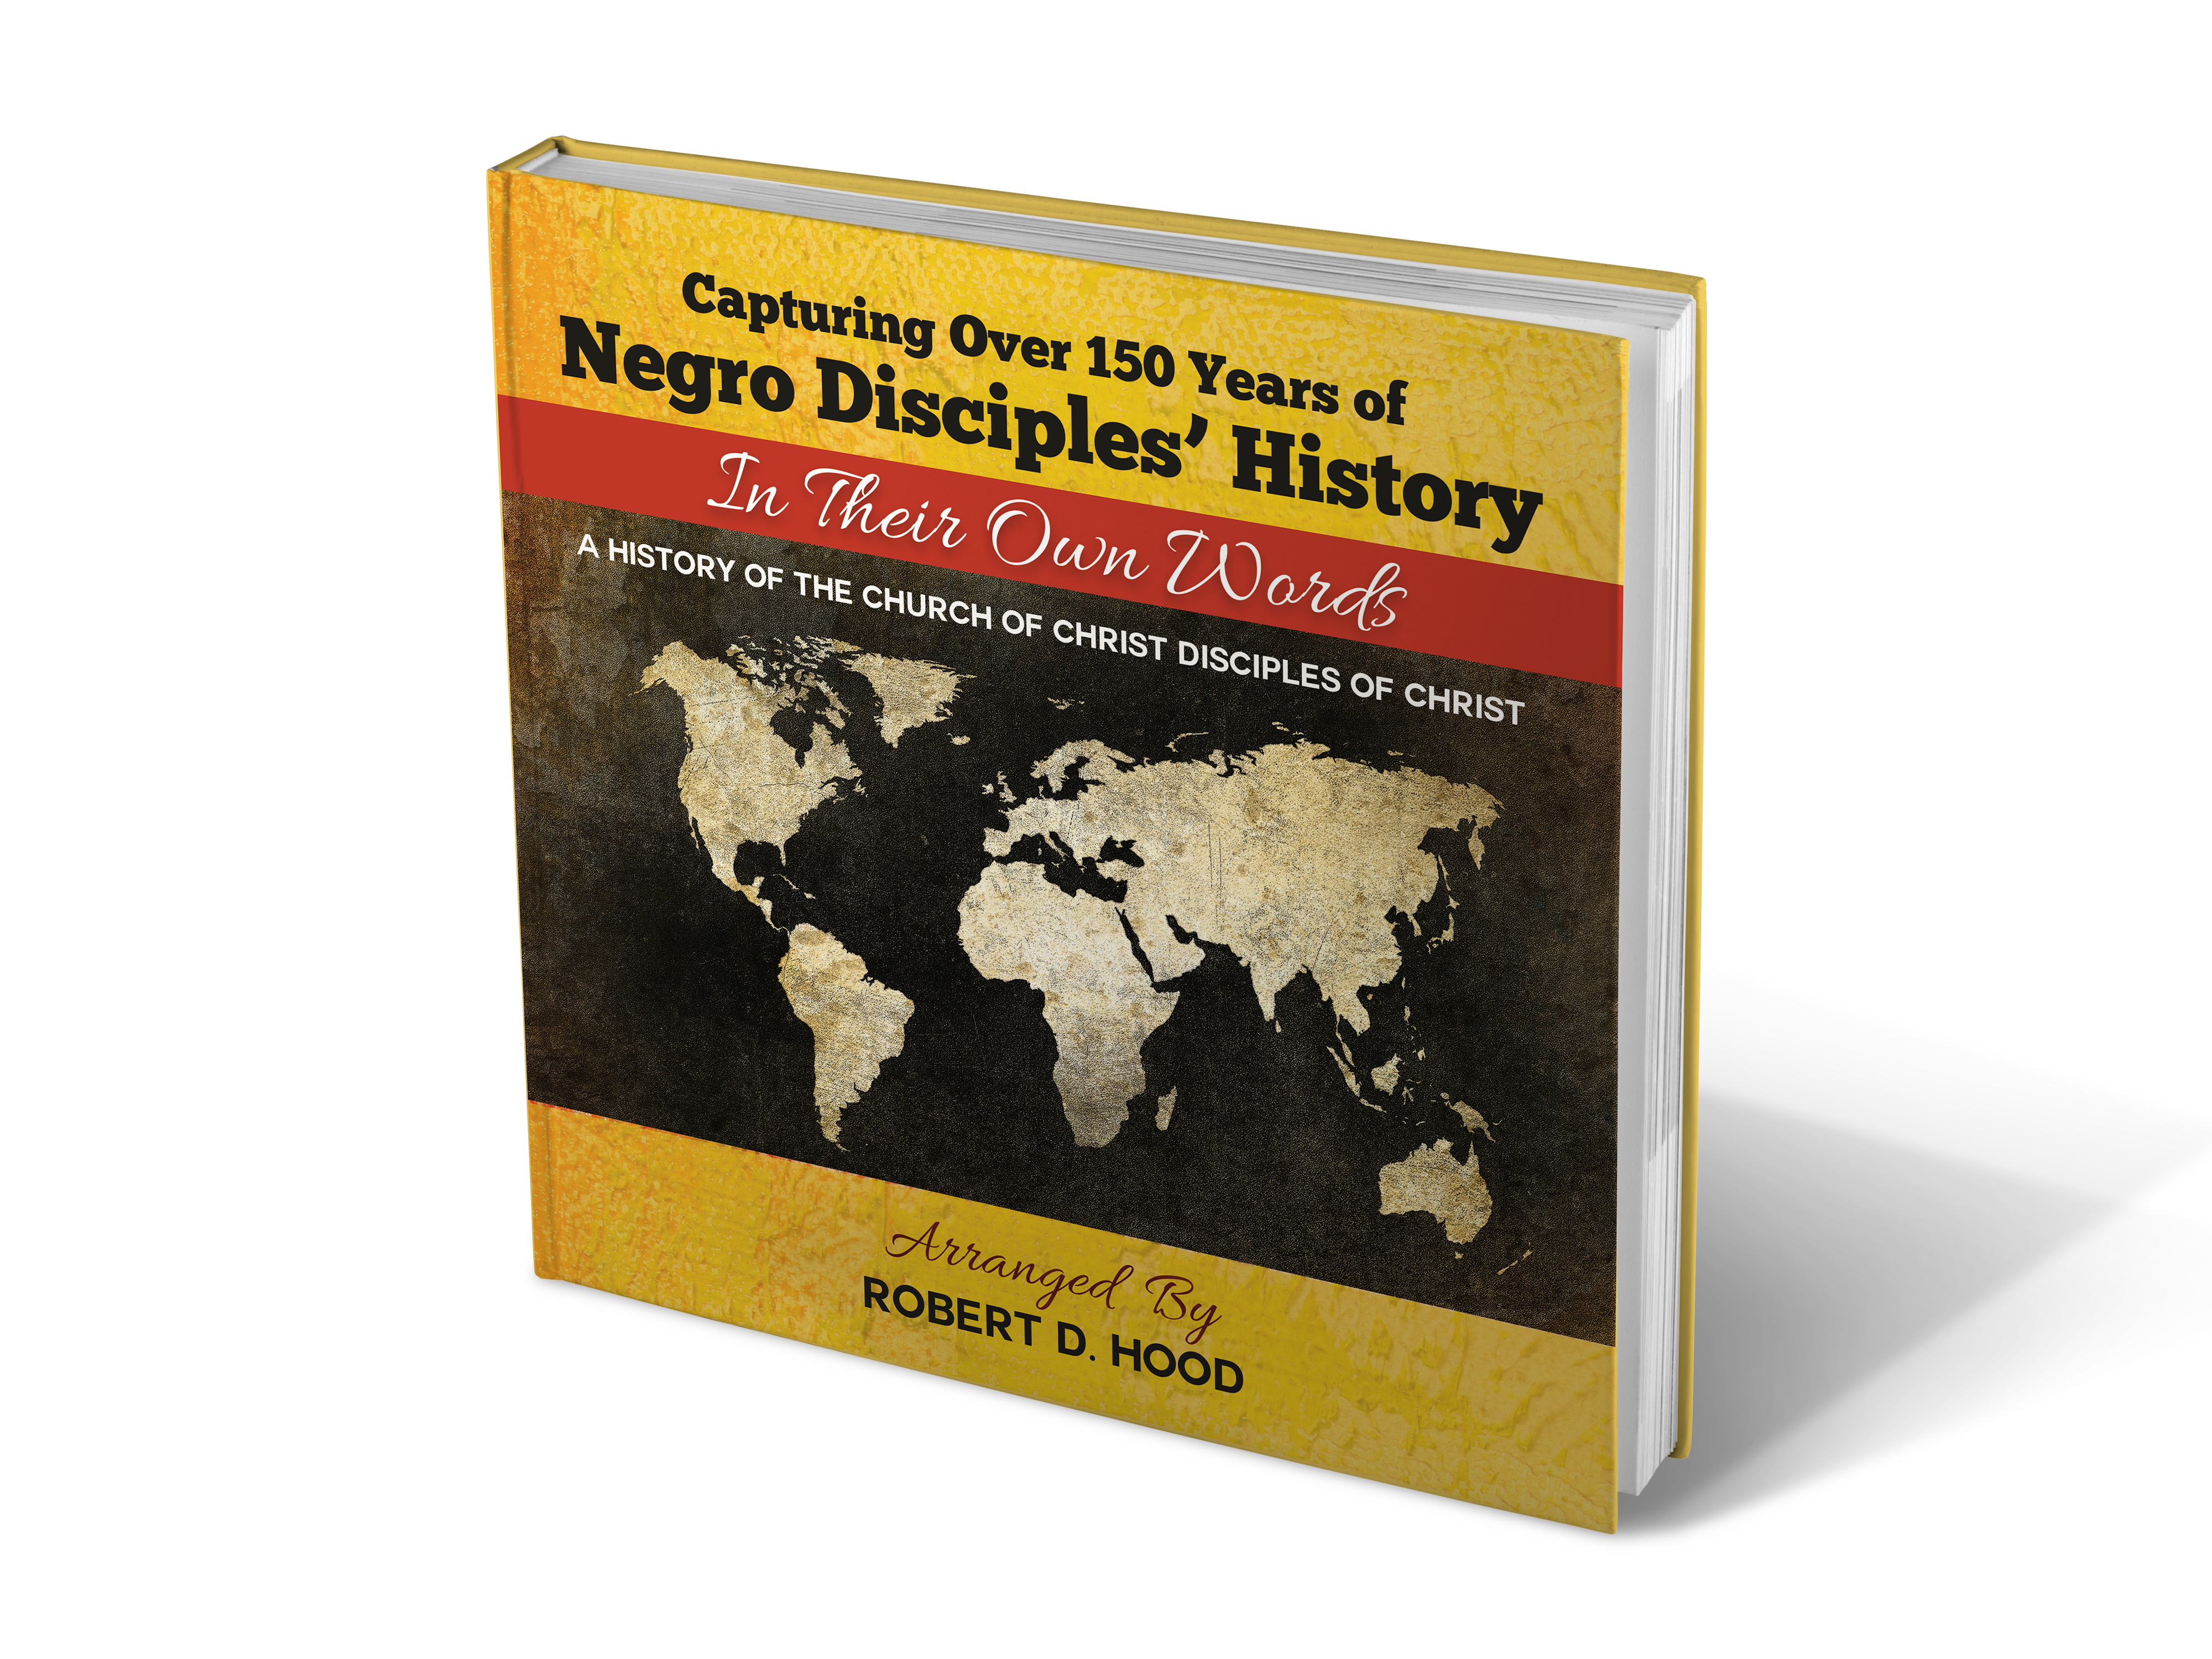 COCDOC HISTORY BOOK